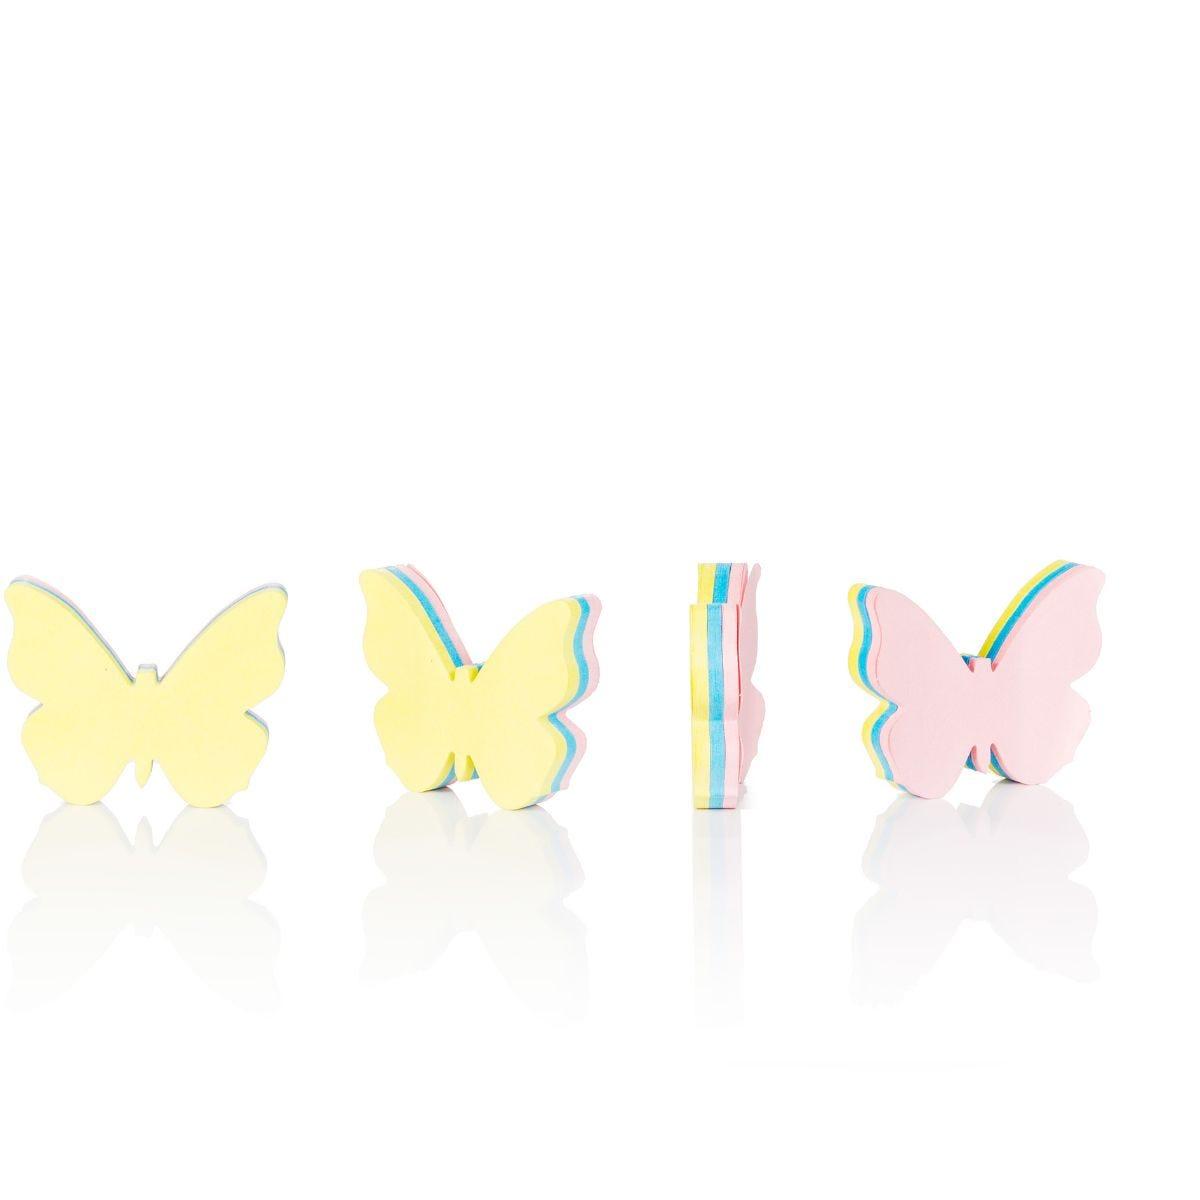 Image of 3D Butterfly Sticky Notes